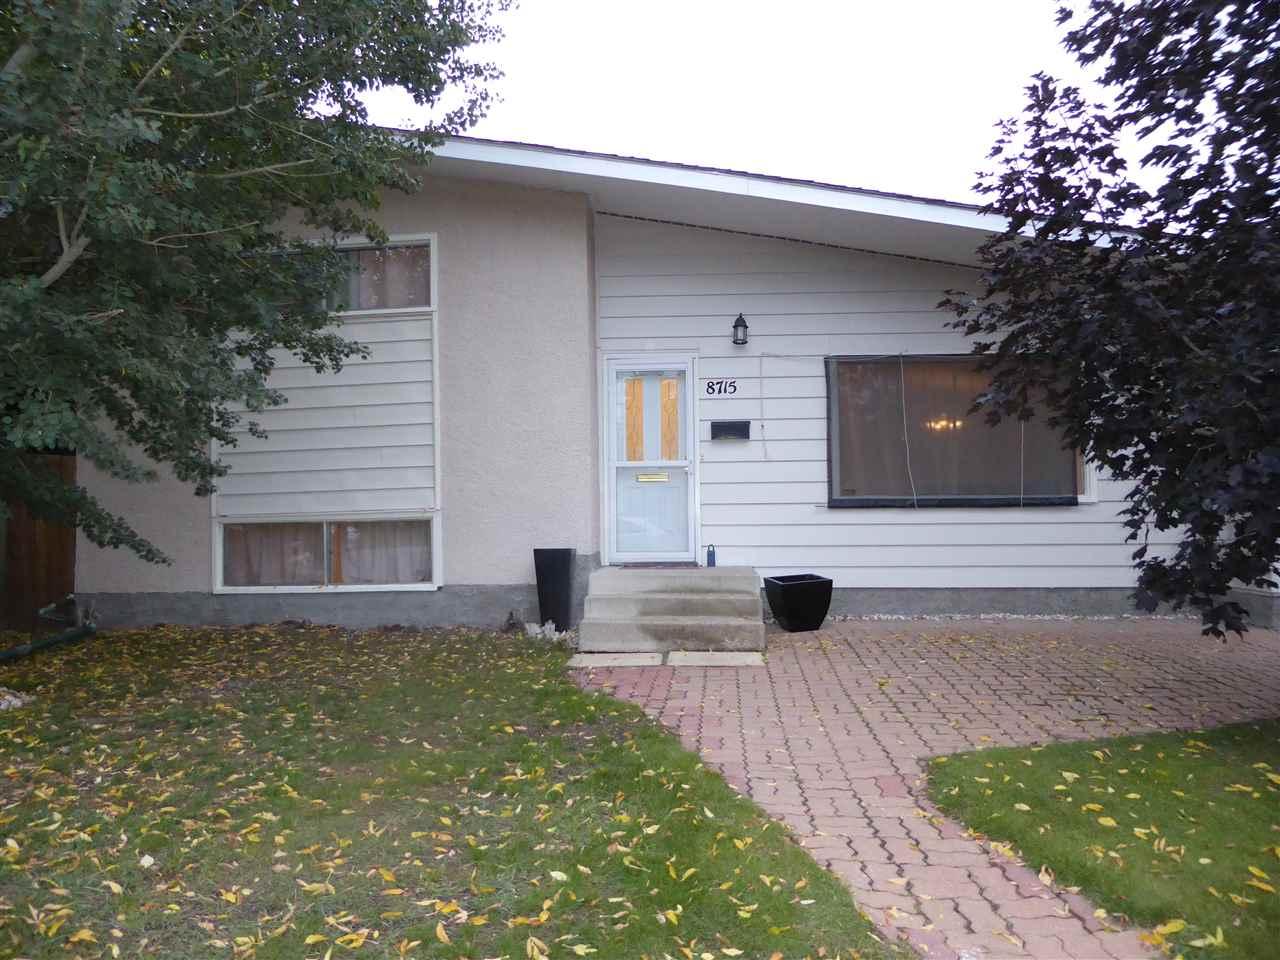 Sold: 8715 164a Street, Edmonton, AB